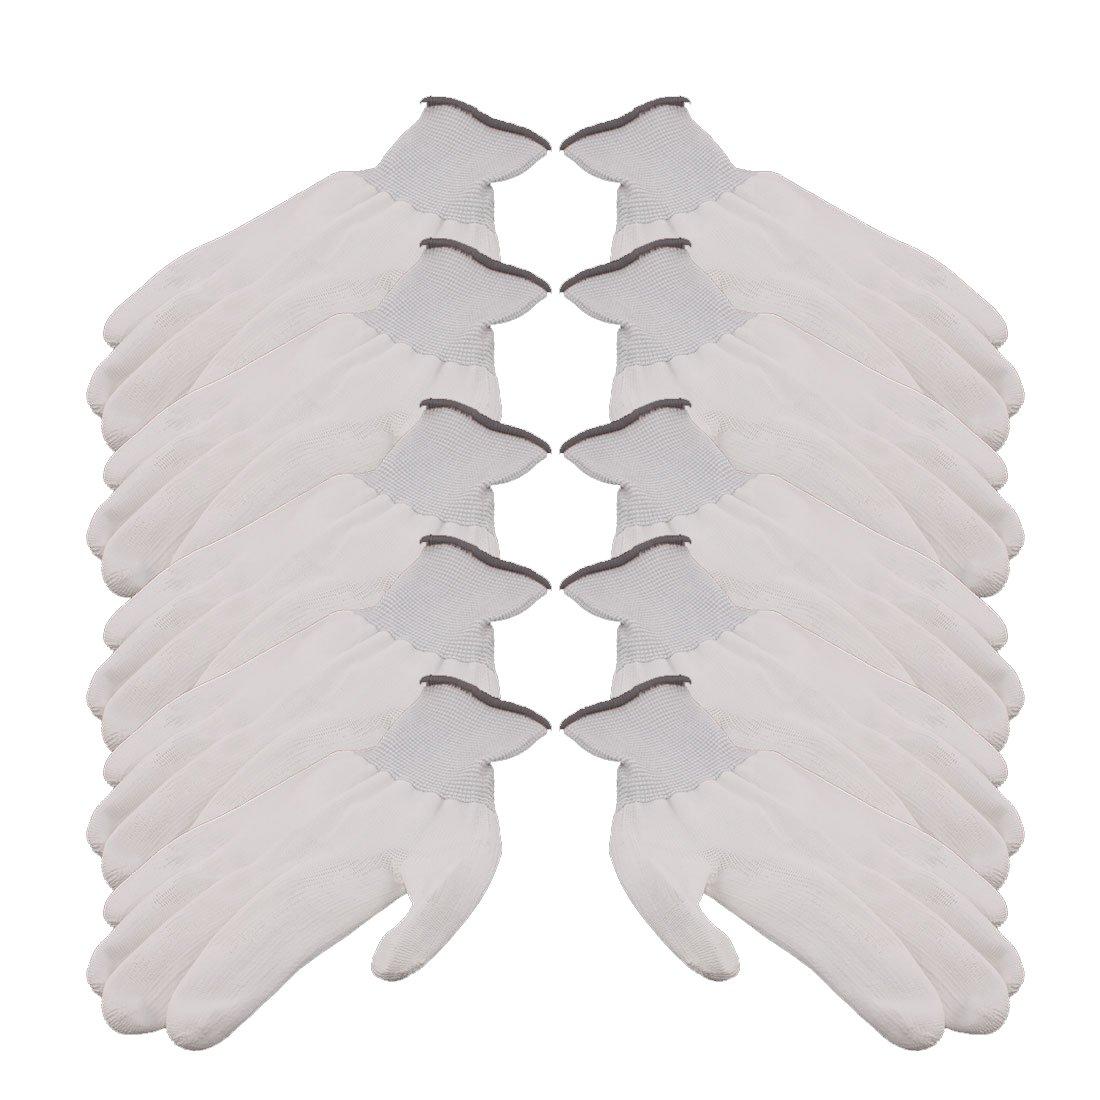 uxcell 5 Pair 13 Needles Nylon Labor Protection Anti-static Non-slip Gloves Gray White